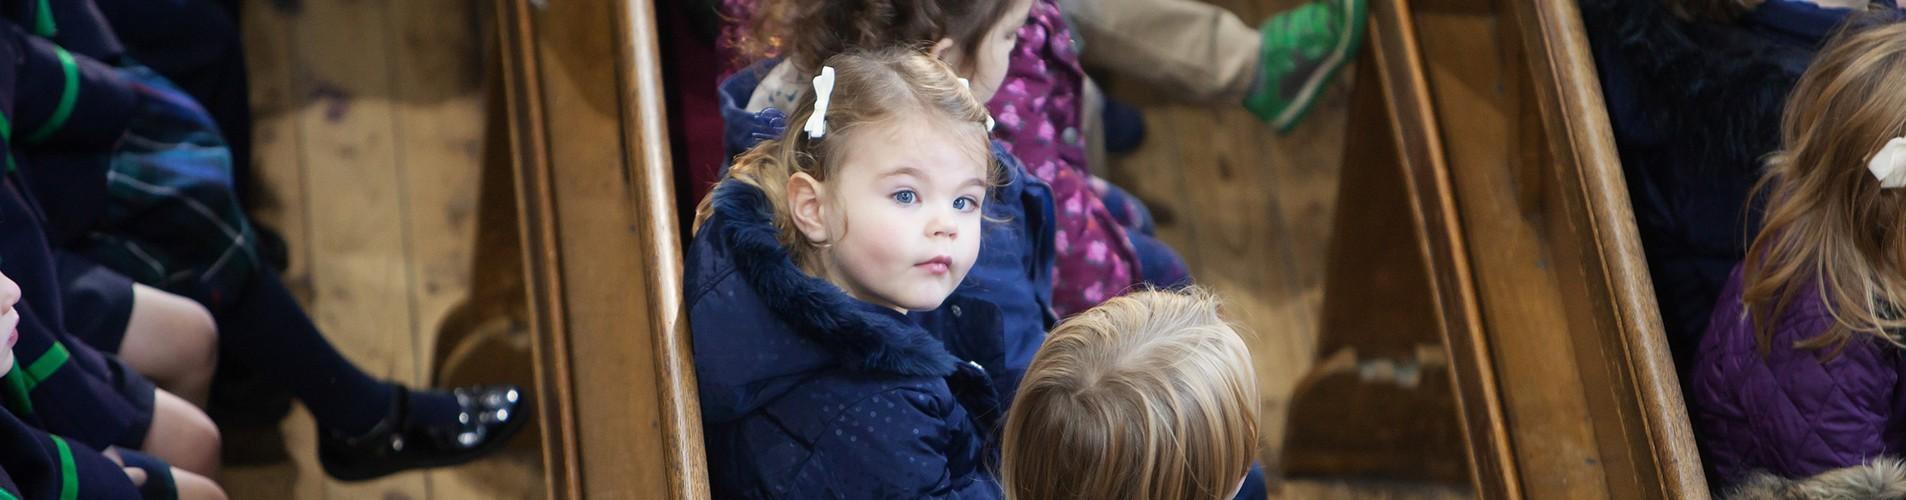 Highfield Pre-School and Nursery pastoral care